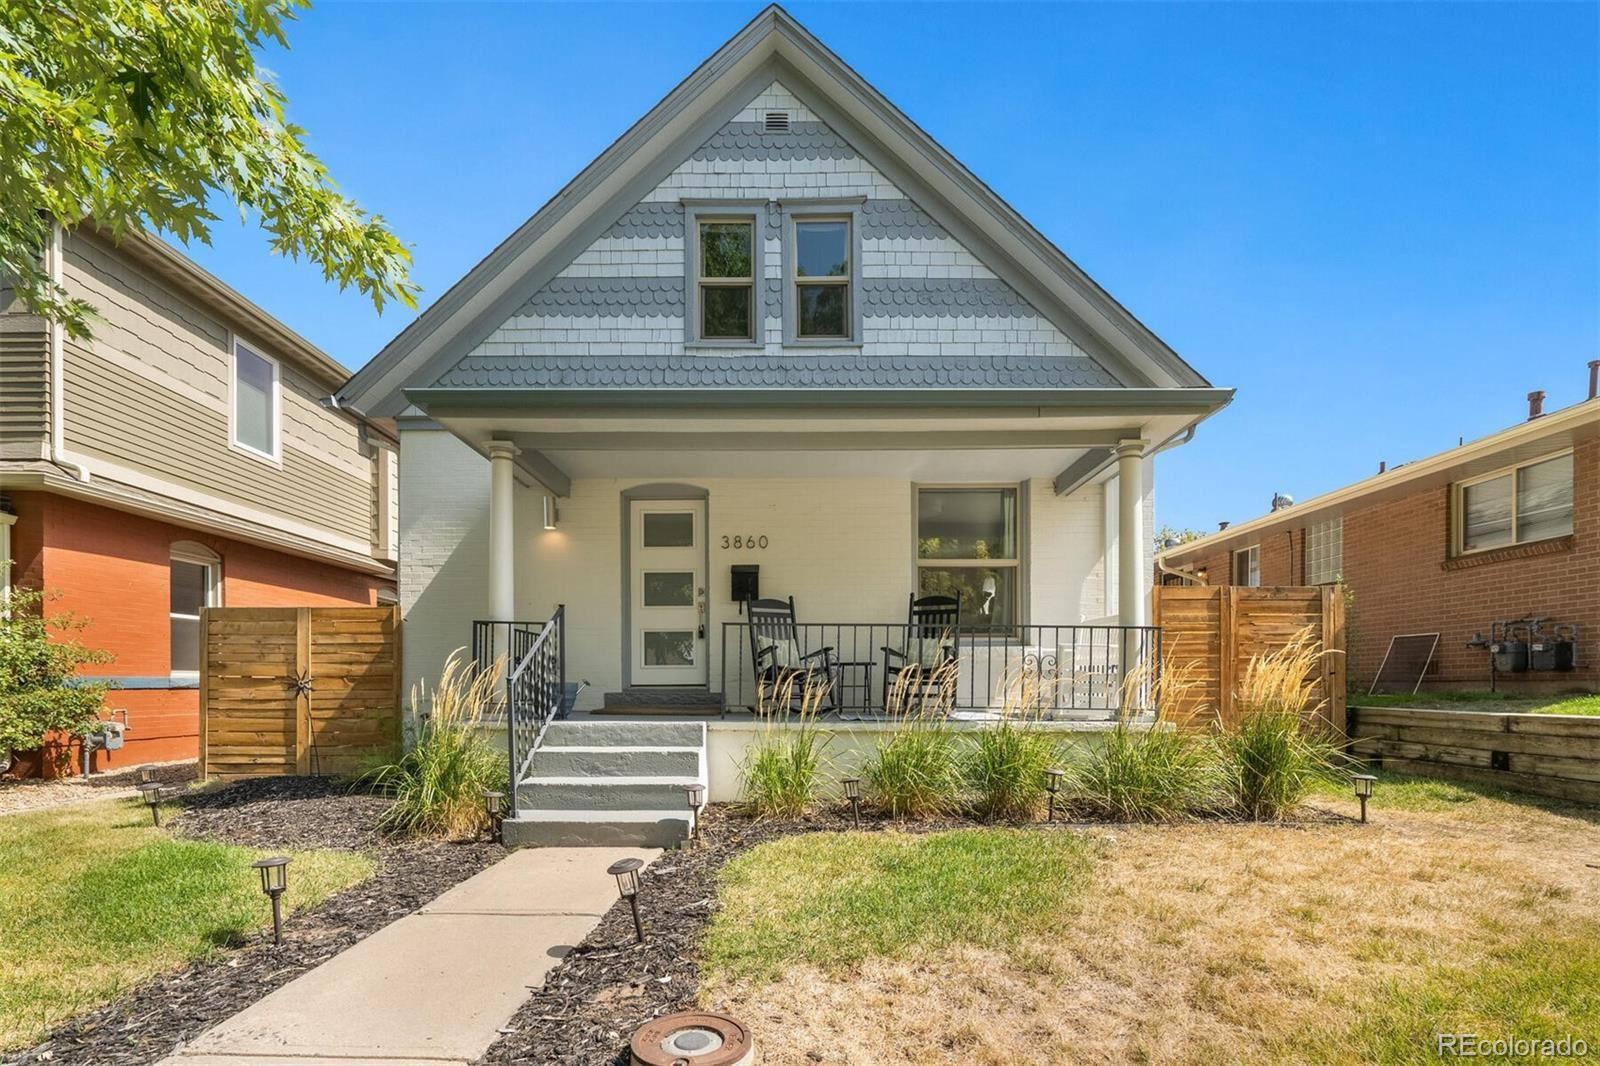 Photo of 3860 Osceola Street, Denver, CO 80212 (MLS # 2262395)